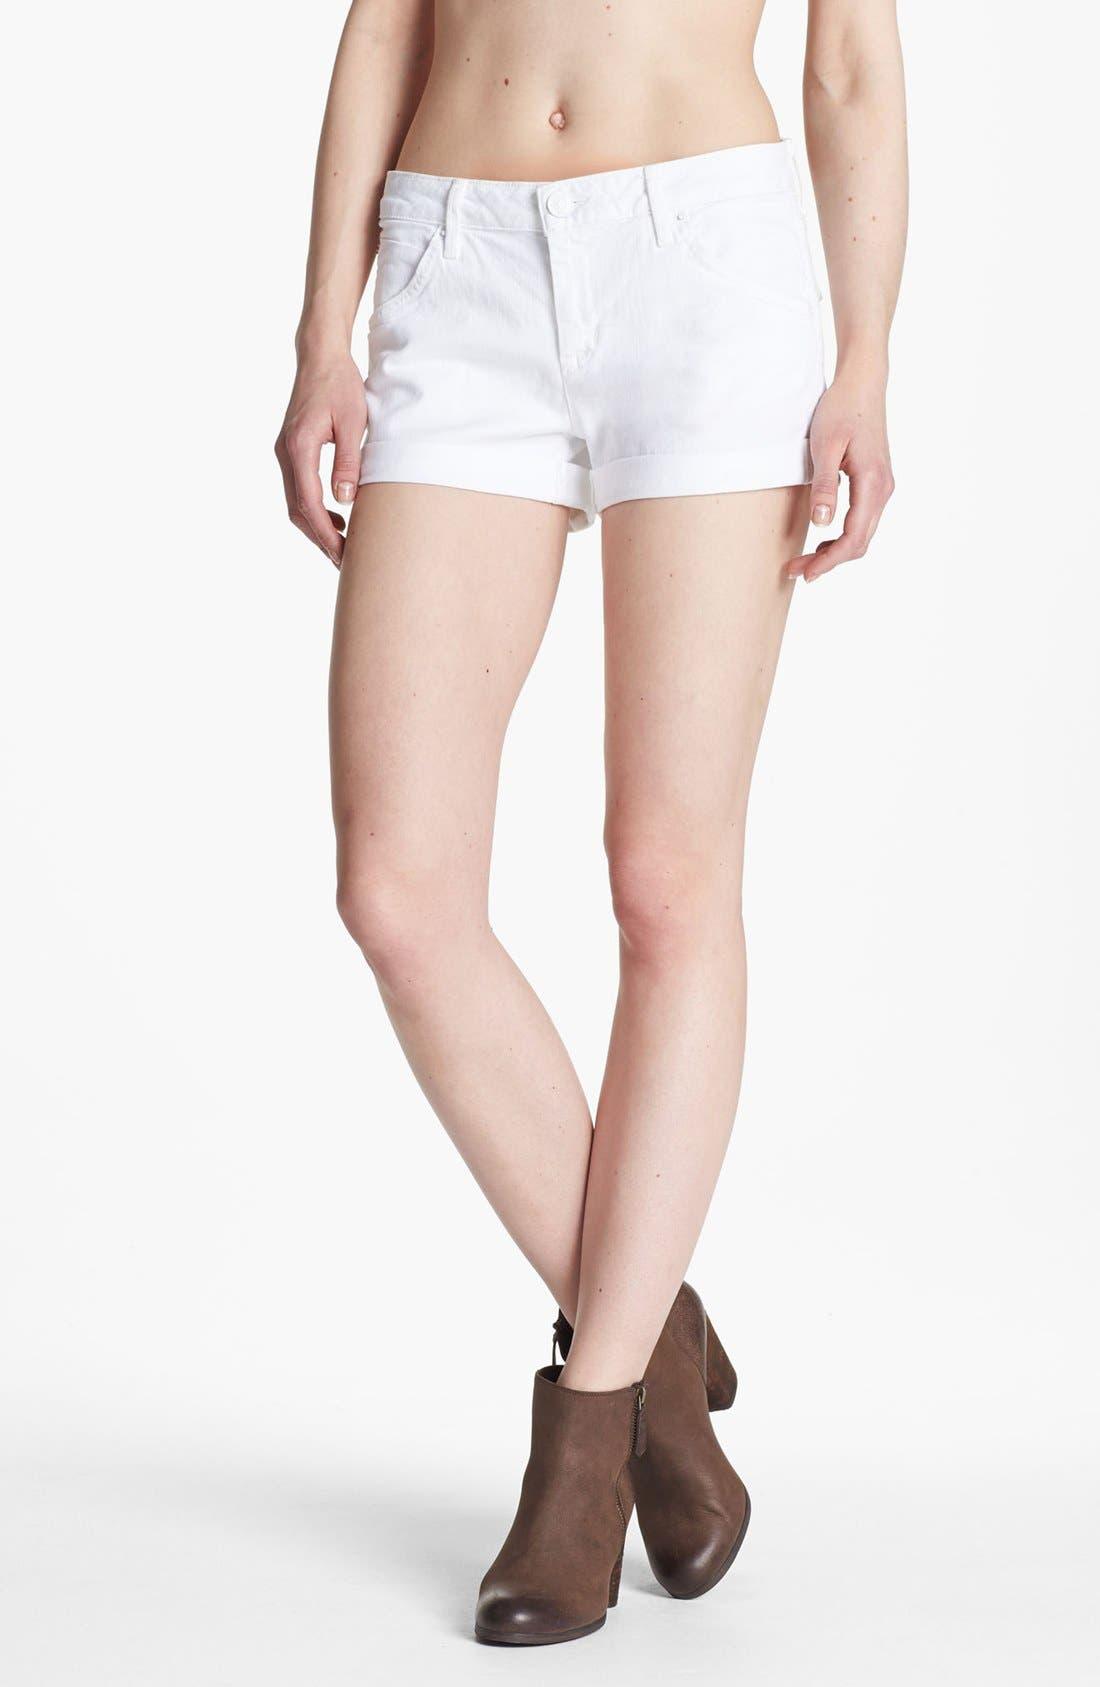 HUDSON JEANS 'Hampton' Cuff Jean Shorts, Main, color, 119